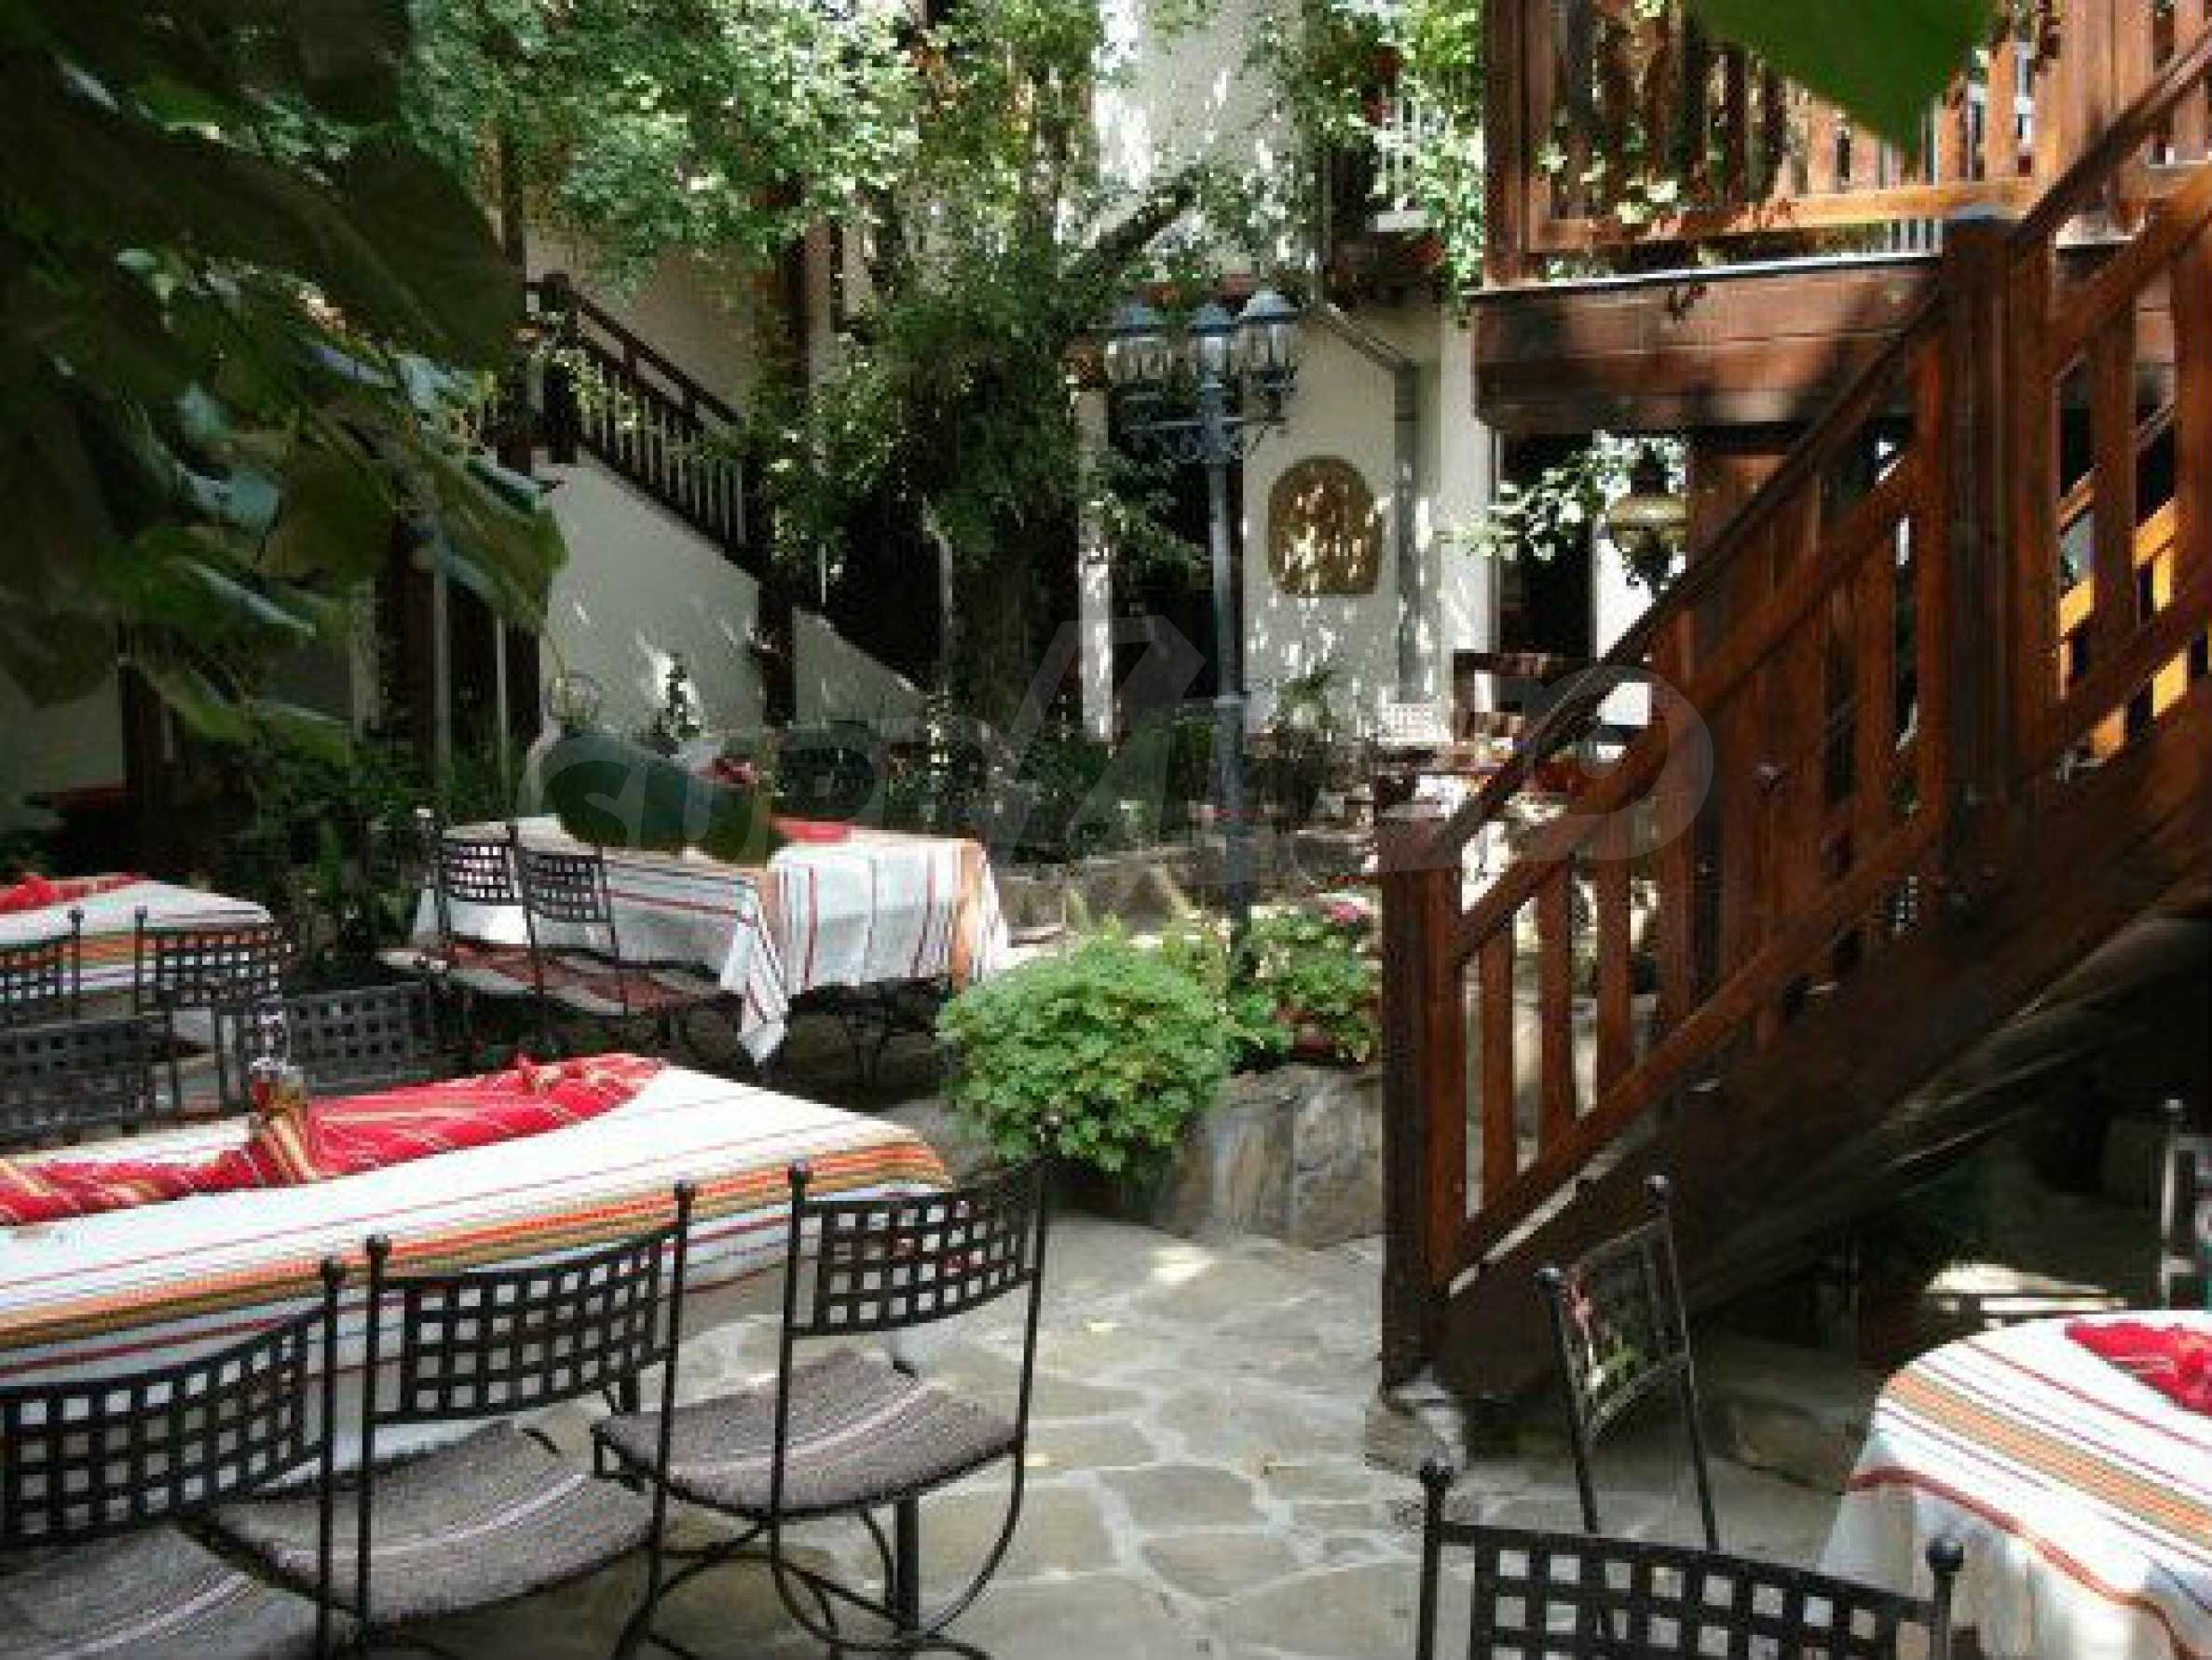 Hotelanlage mit Restaurant am Ufer des Flusses Osam in Lovech 67